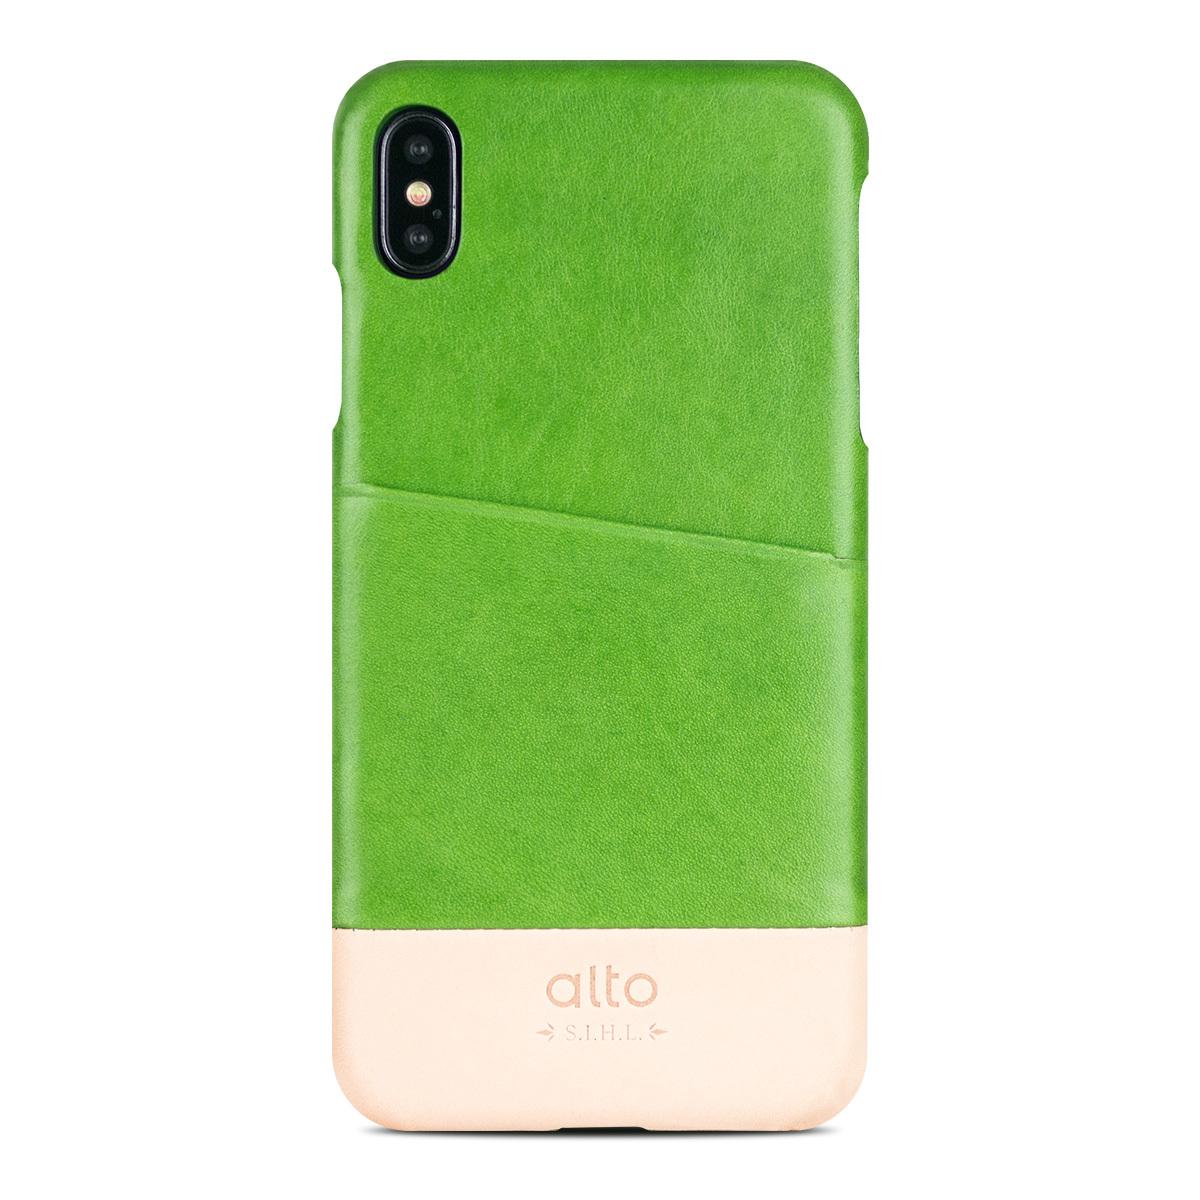 iPhone Xs Max 皮革保護殼 Metro Leather Case 萊姆綠/本色